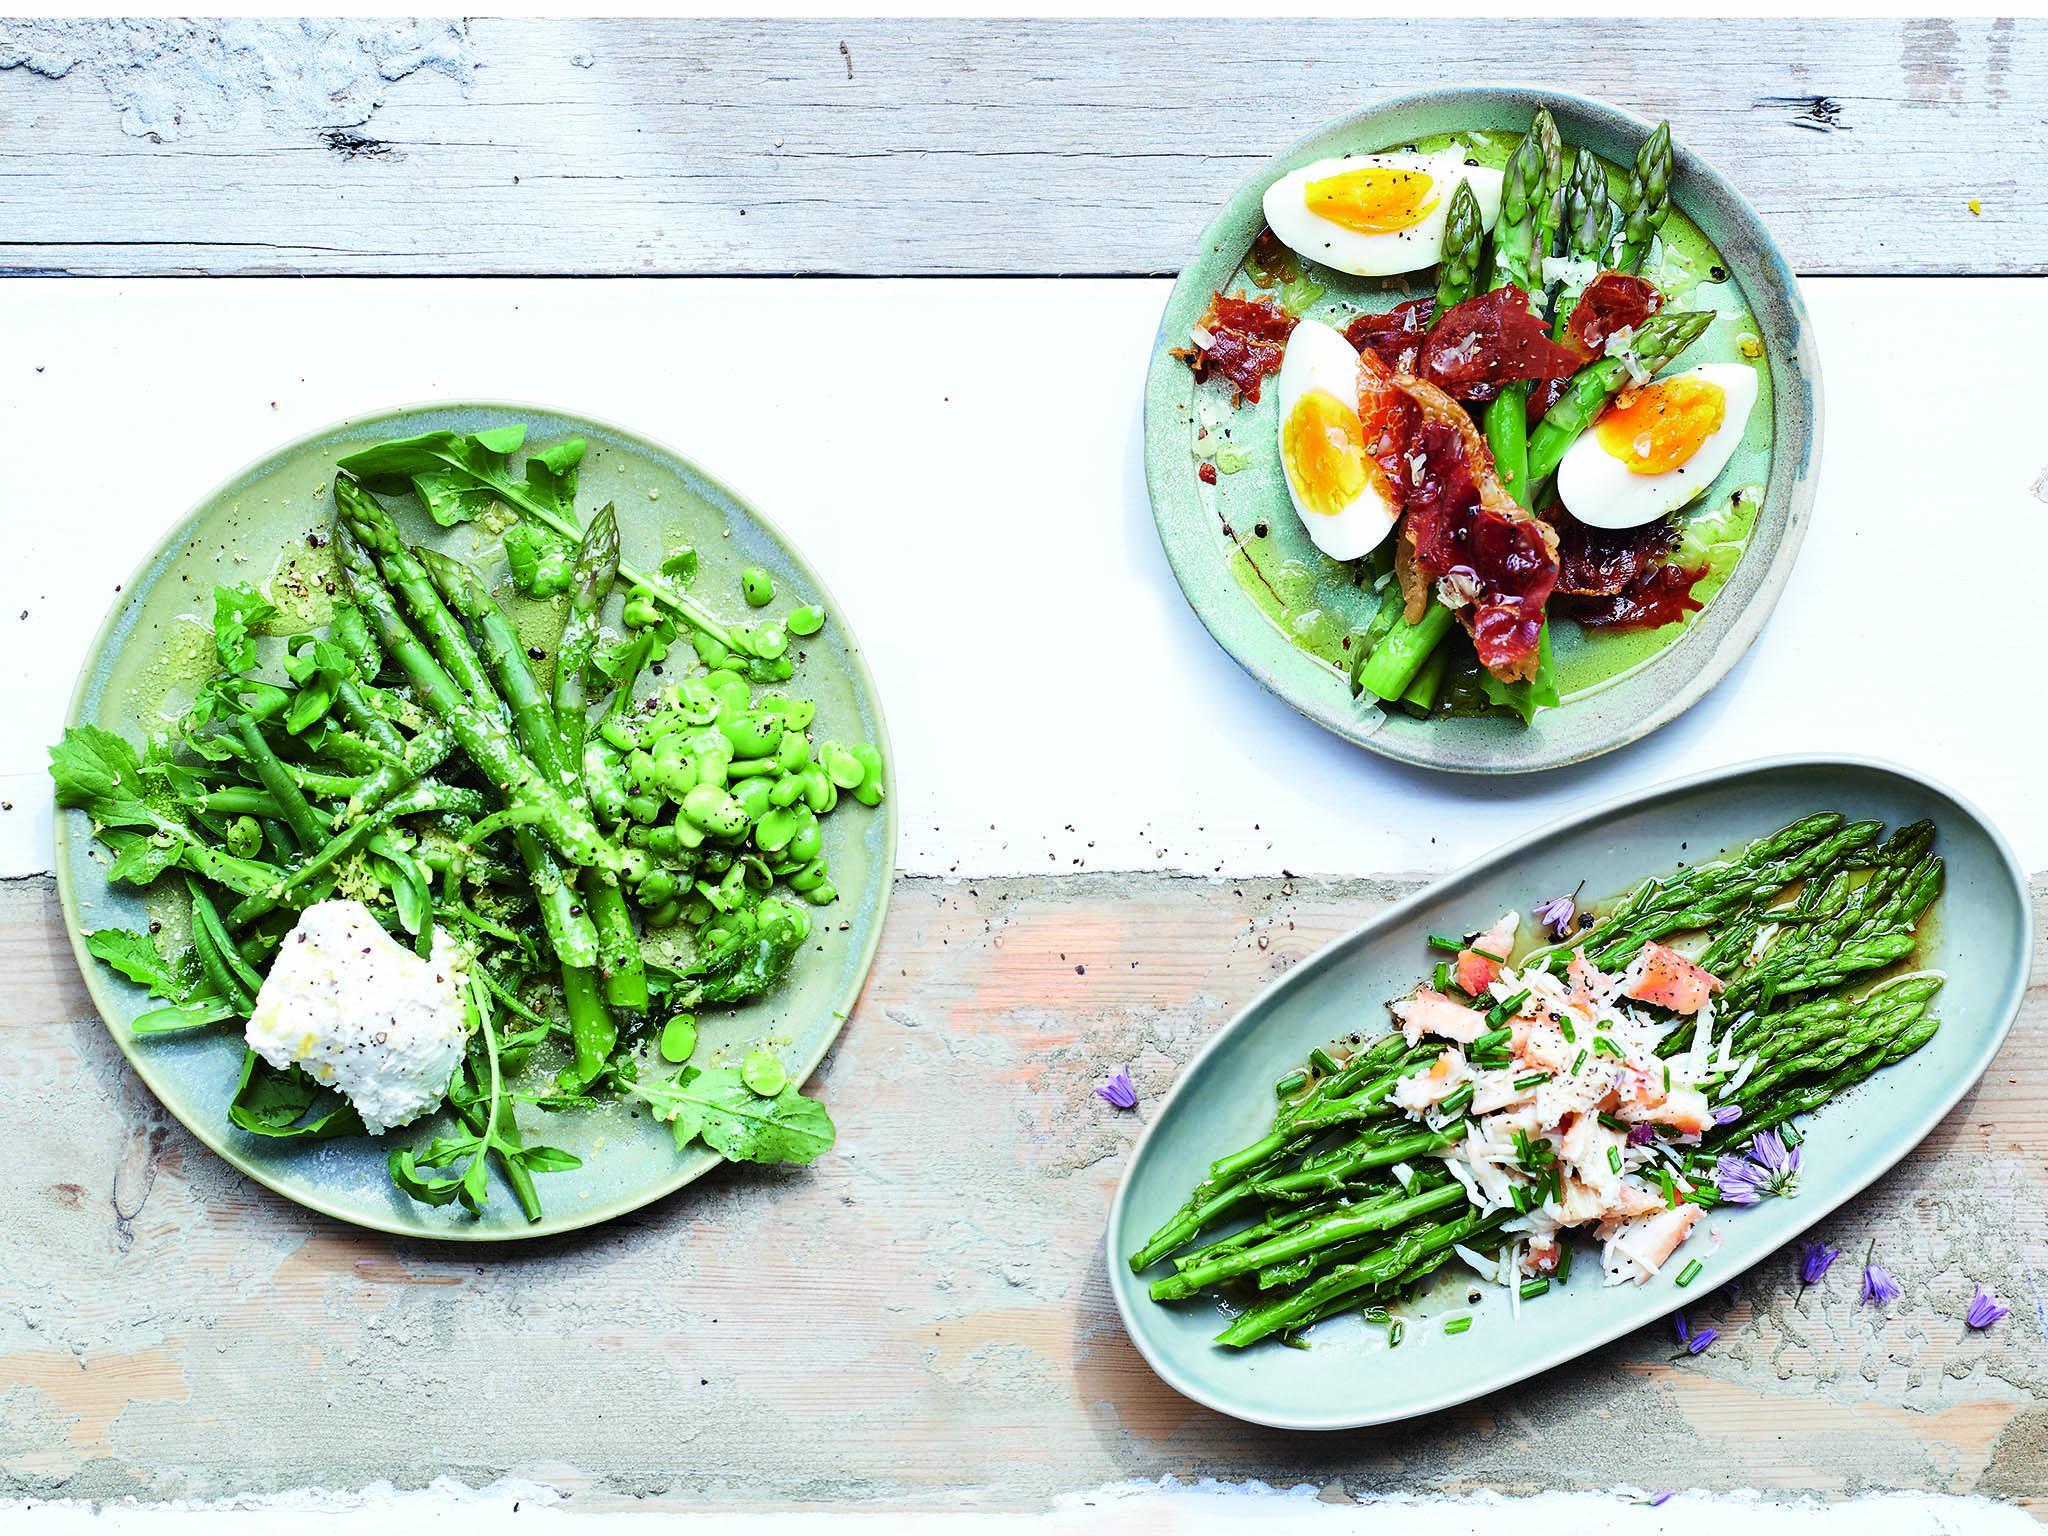 Eivissa – The Ibiza cookbook recipes From watermelon gazpacho to